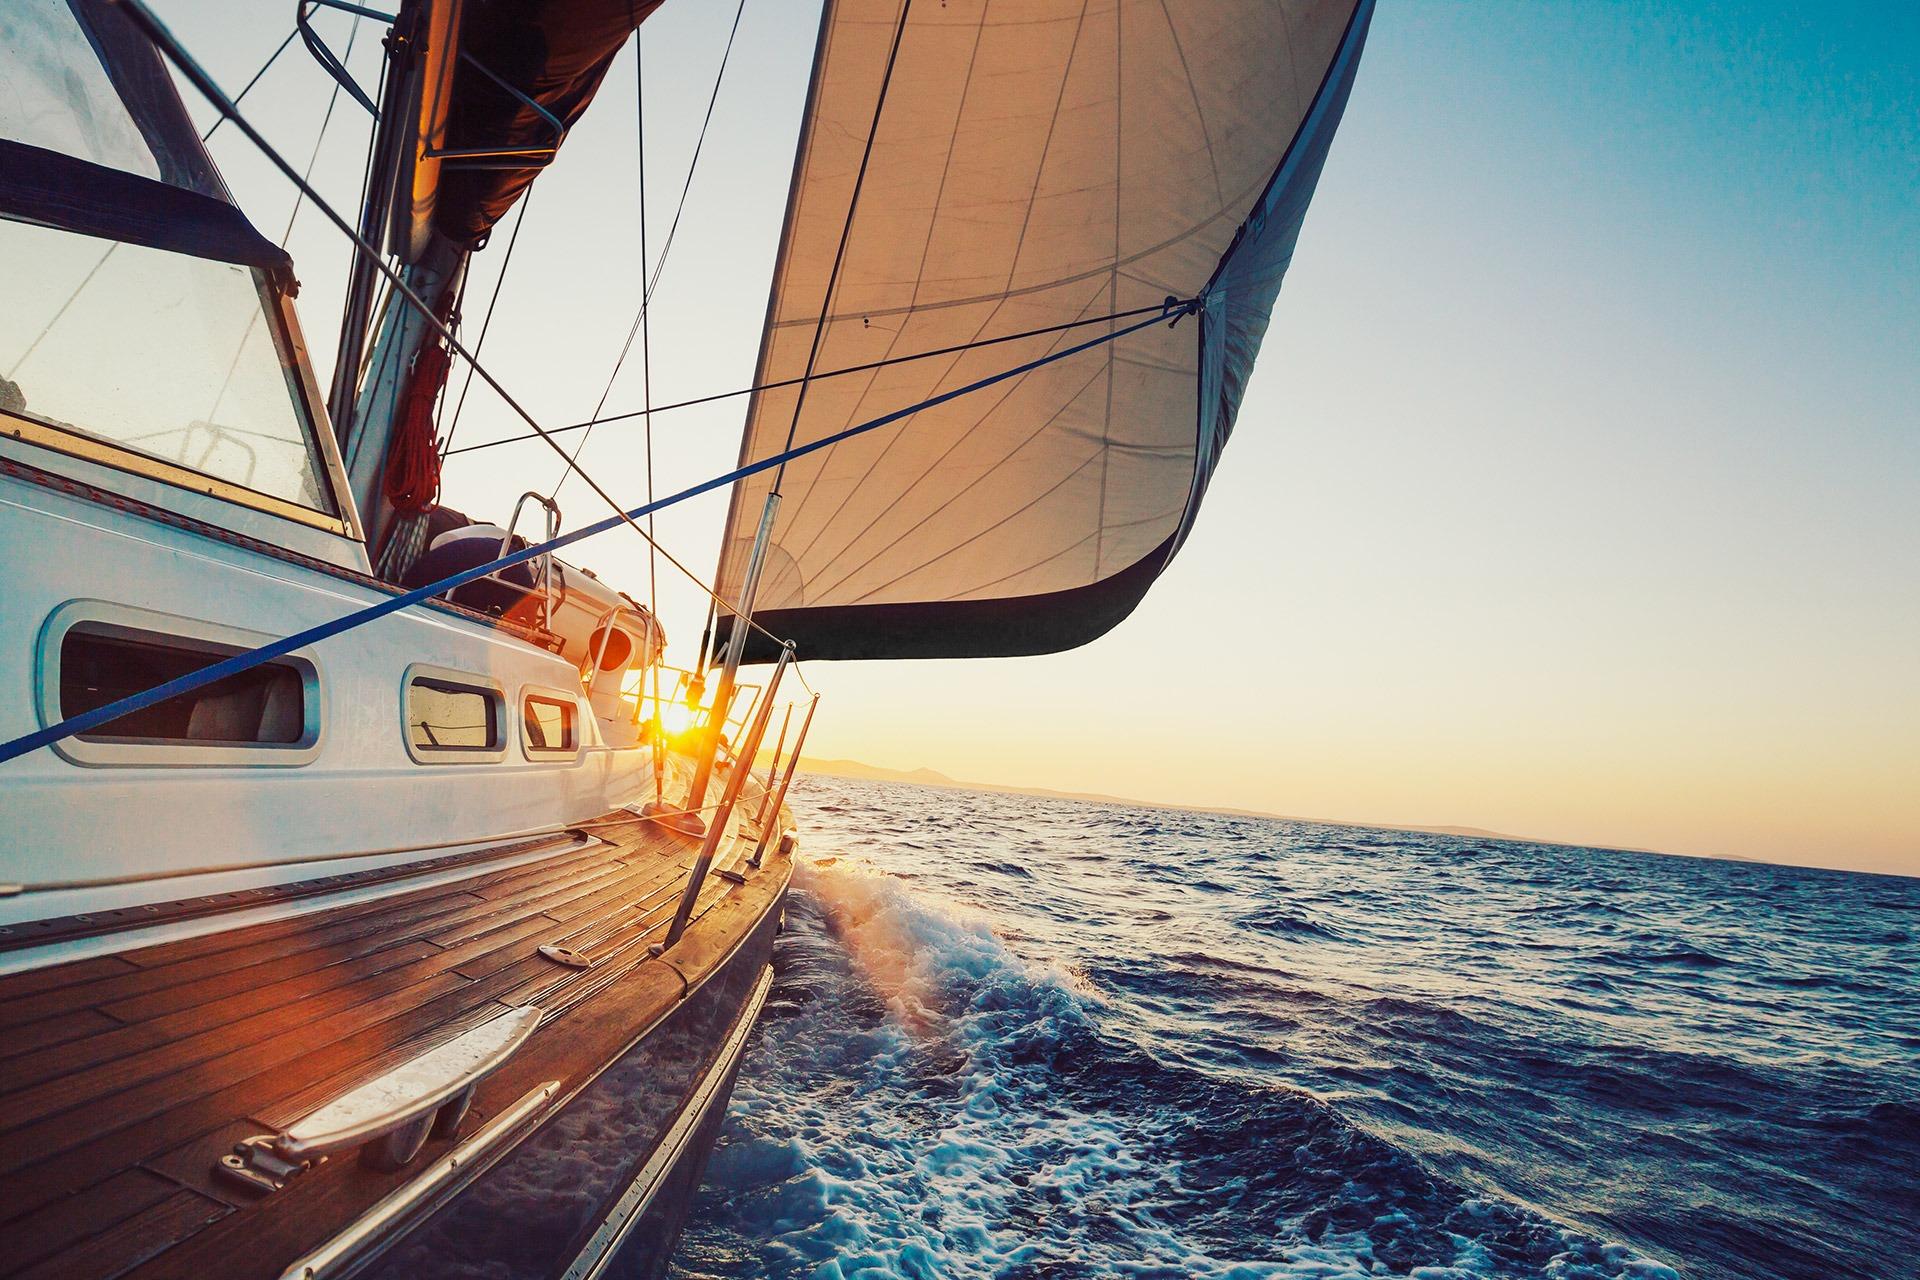 https://skivesejlklub.dk/wp-content/uploads/2019/02/sailing-PLVH62M.jpg